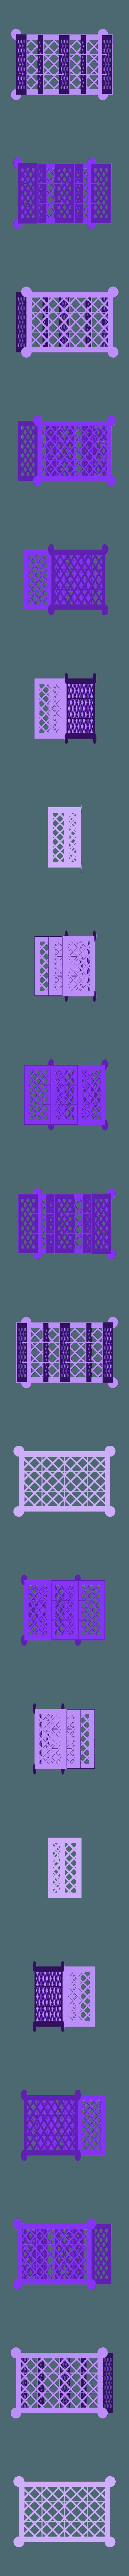 12tentacles-v2.stl Download free STL file Shadows of brimstone box organizer • 3D print object, gthanatos